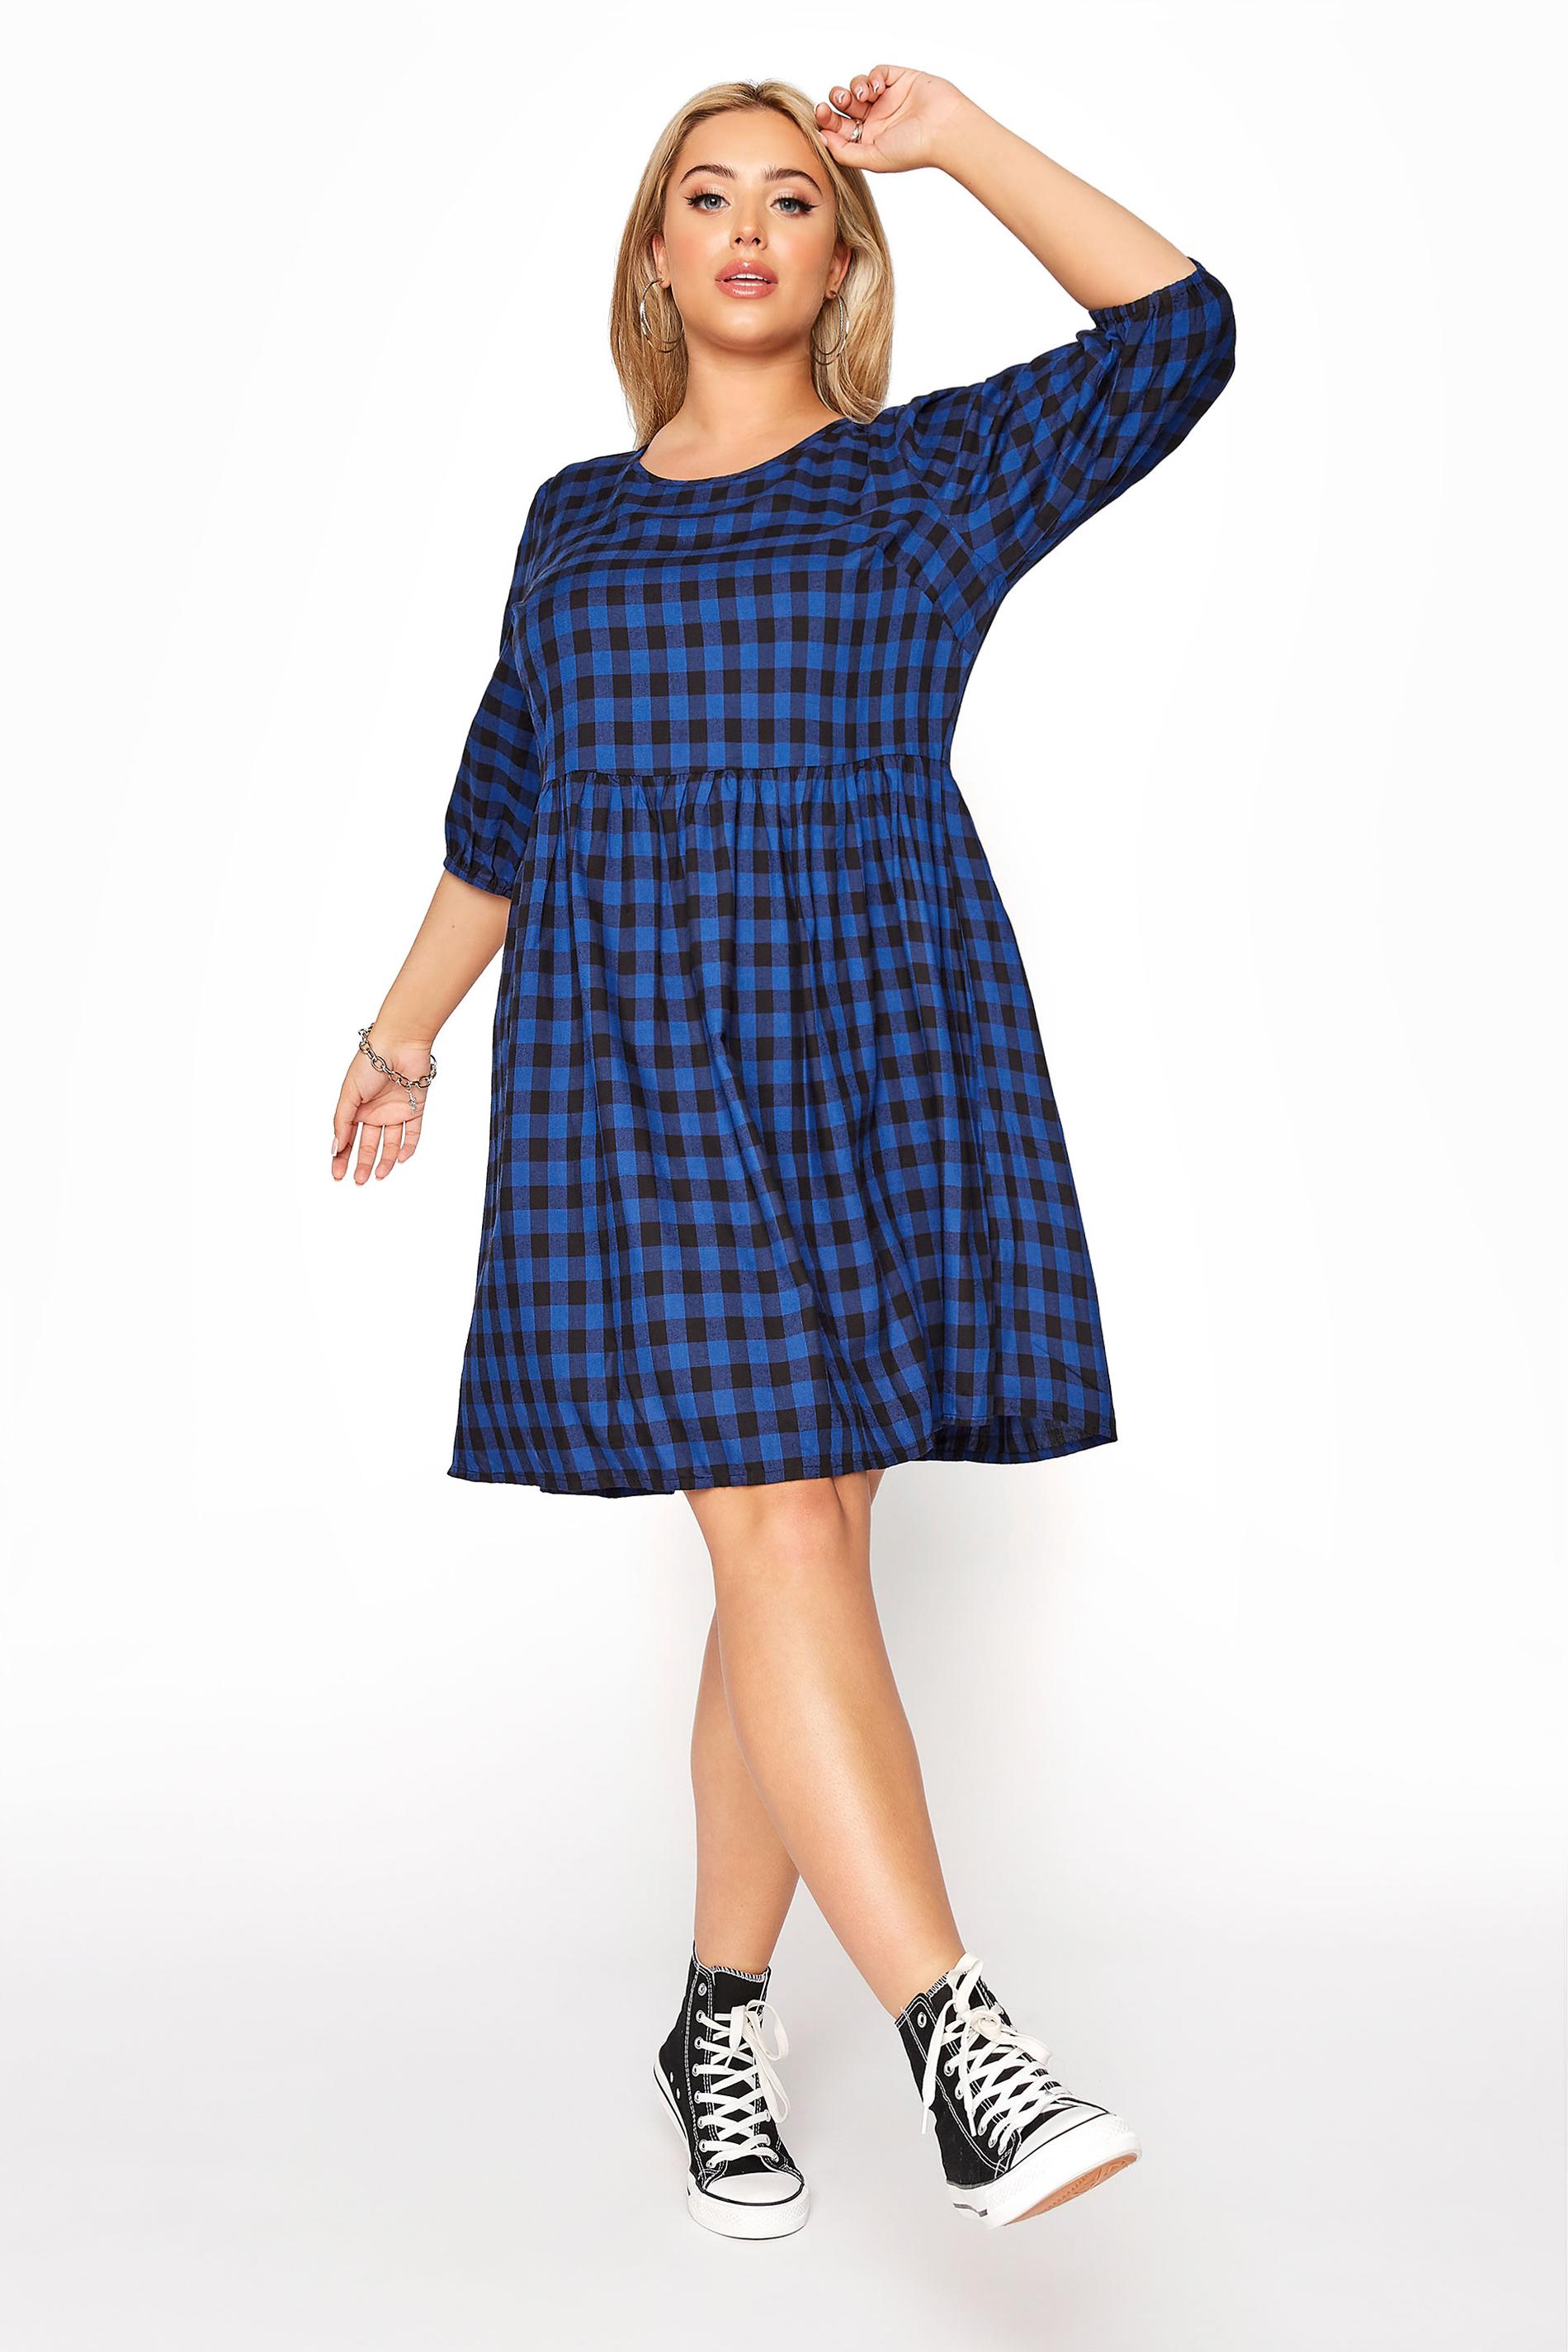 Cobalt Blue Gingham Peplum Dress_9b32.jpg